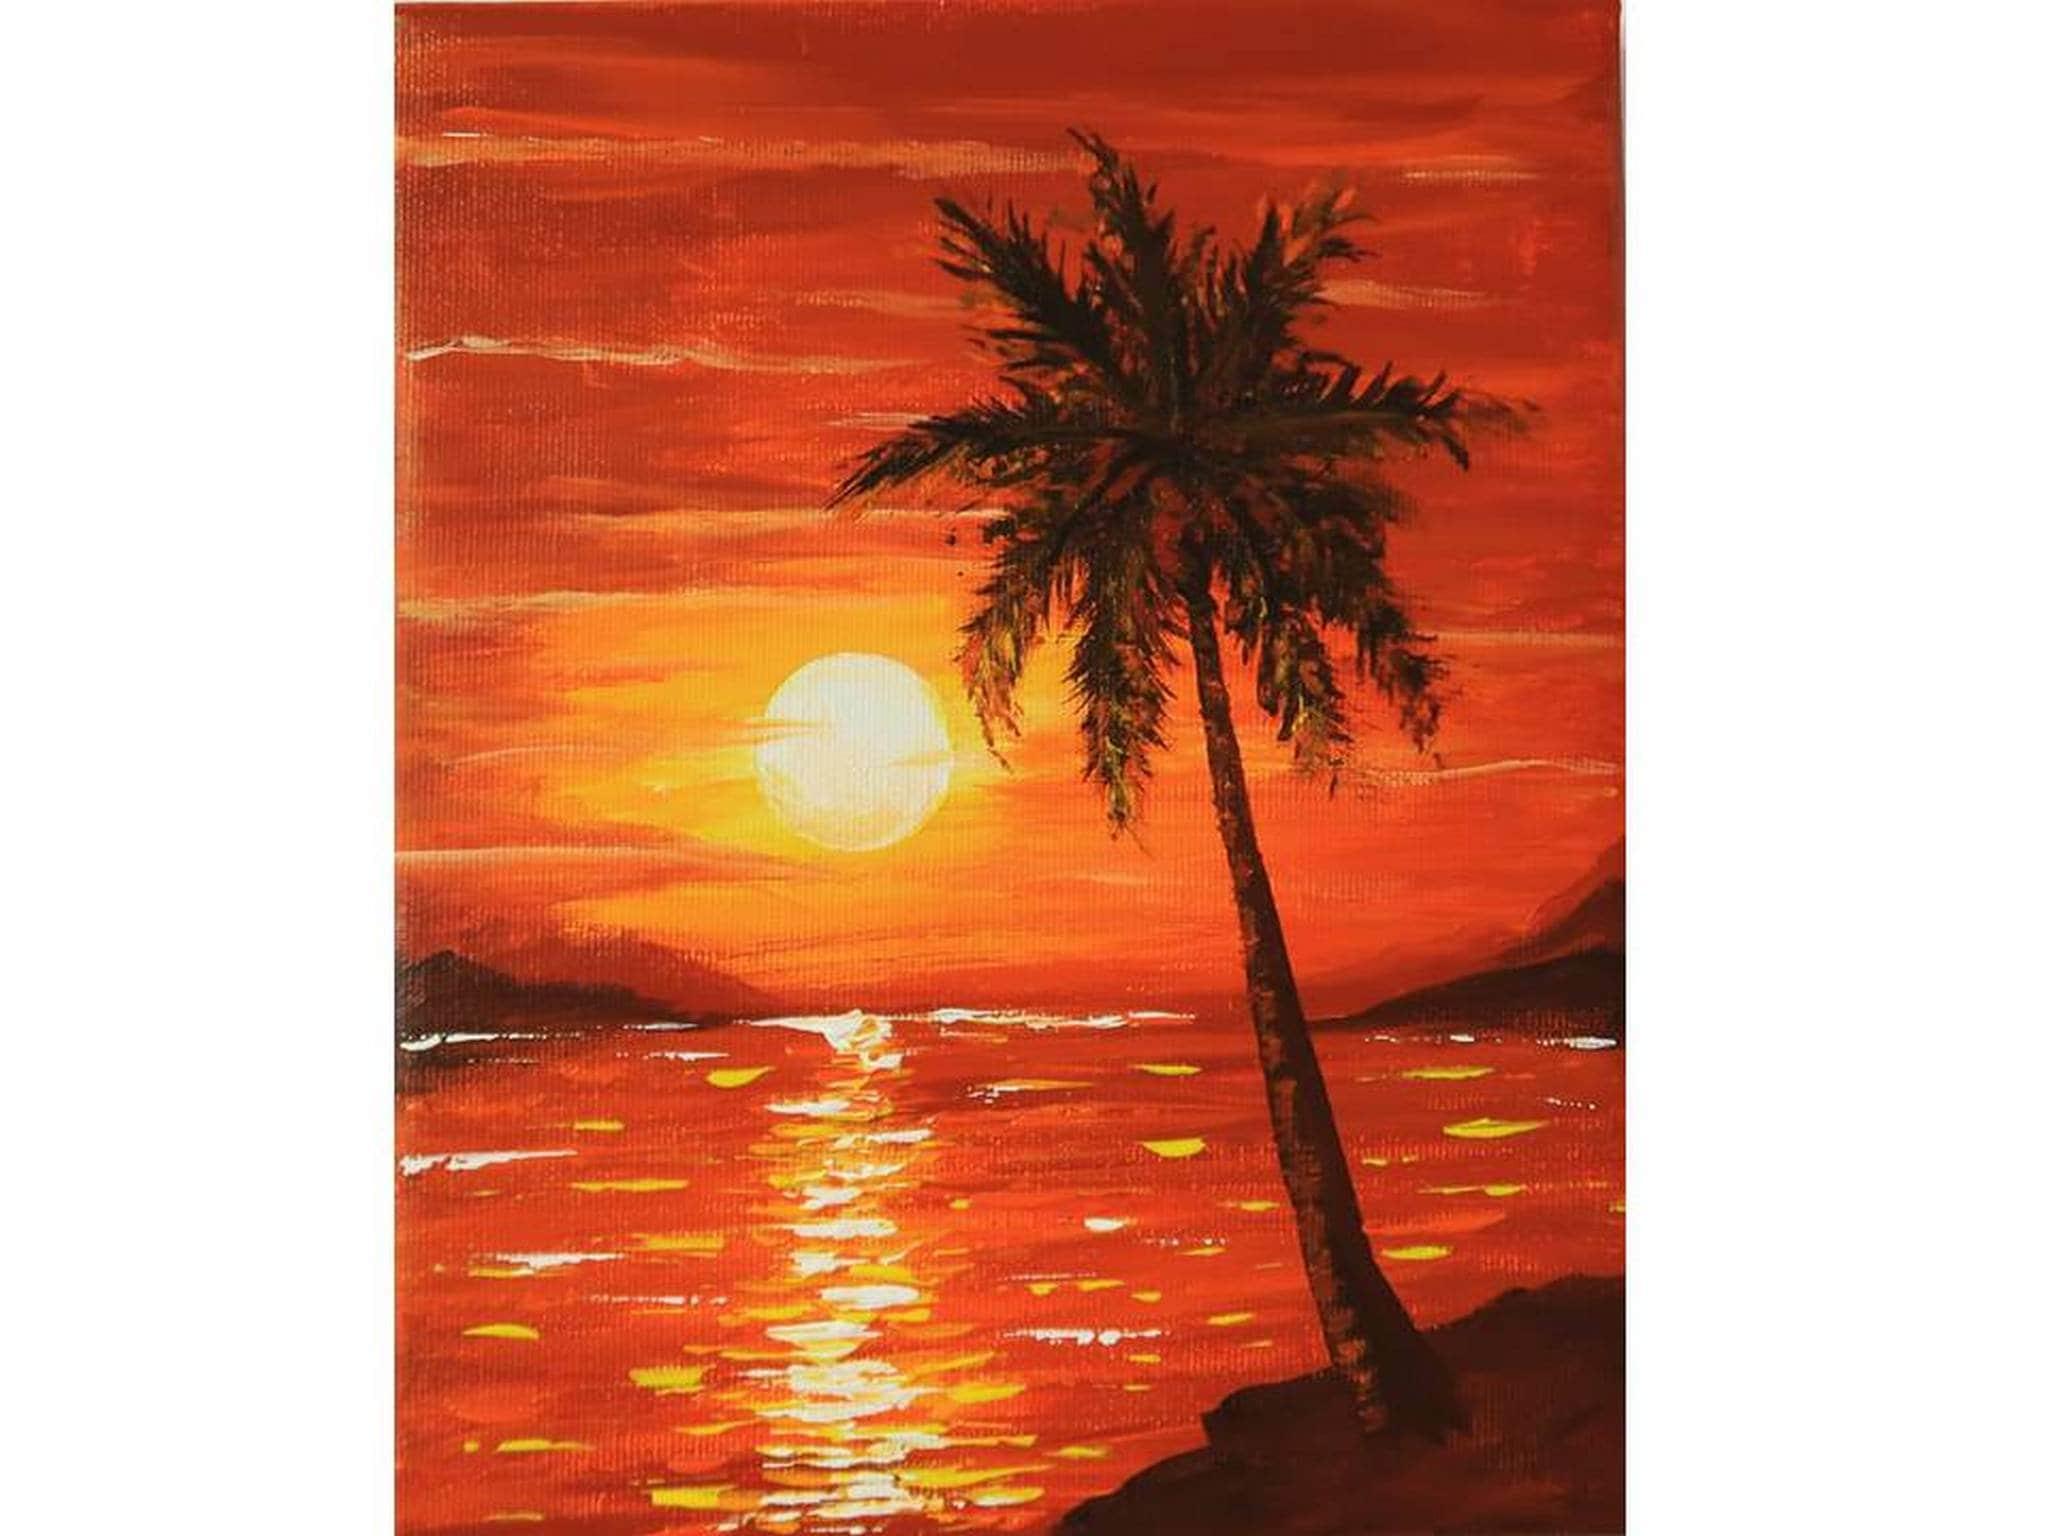 Hawaii Painting Seascape Original Art Palm Trees National Park Sunset Acrylic Painting Ocean Art by Julia Datta